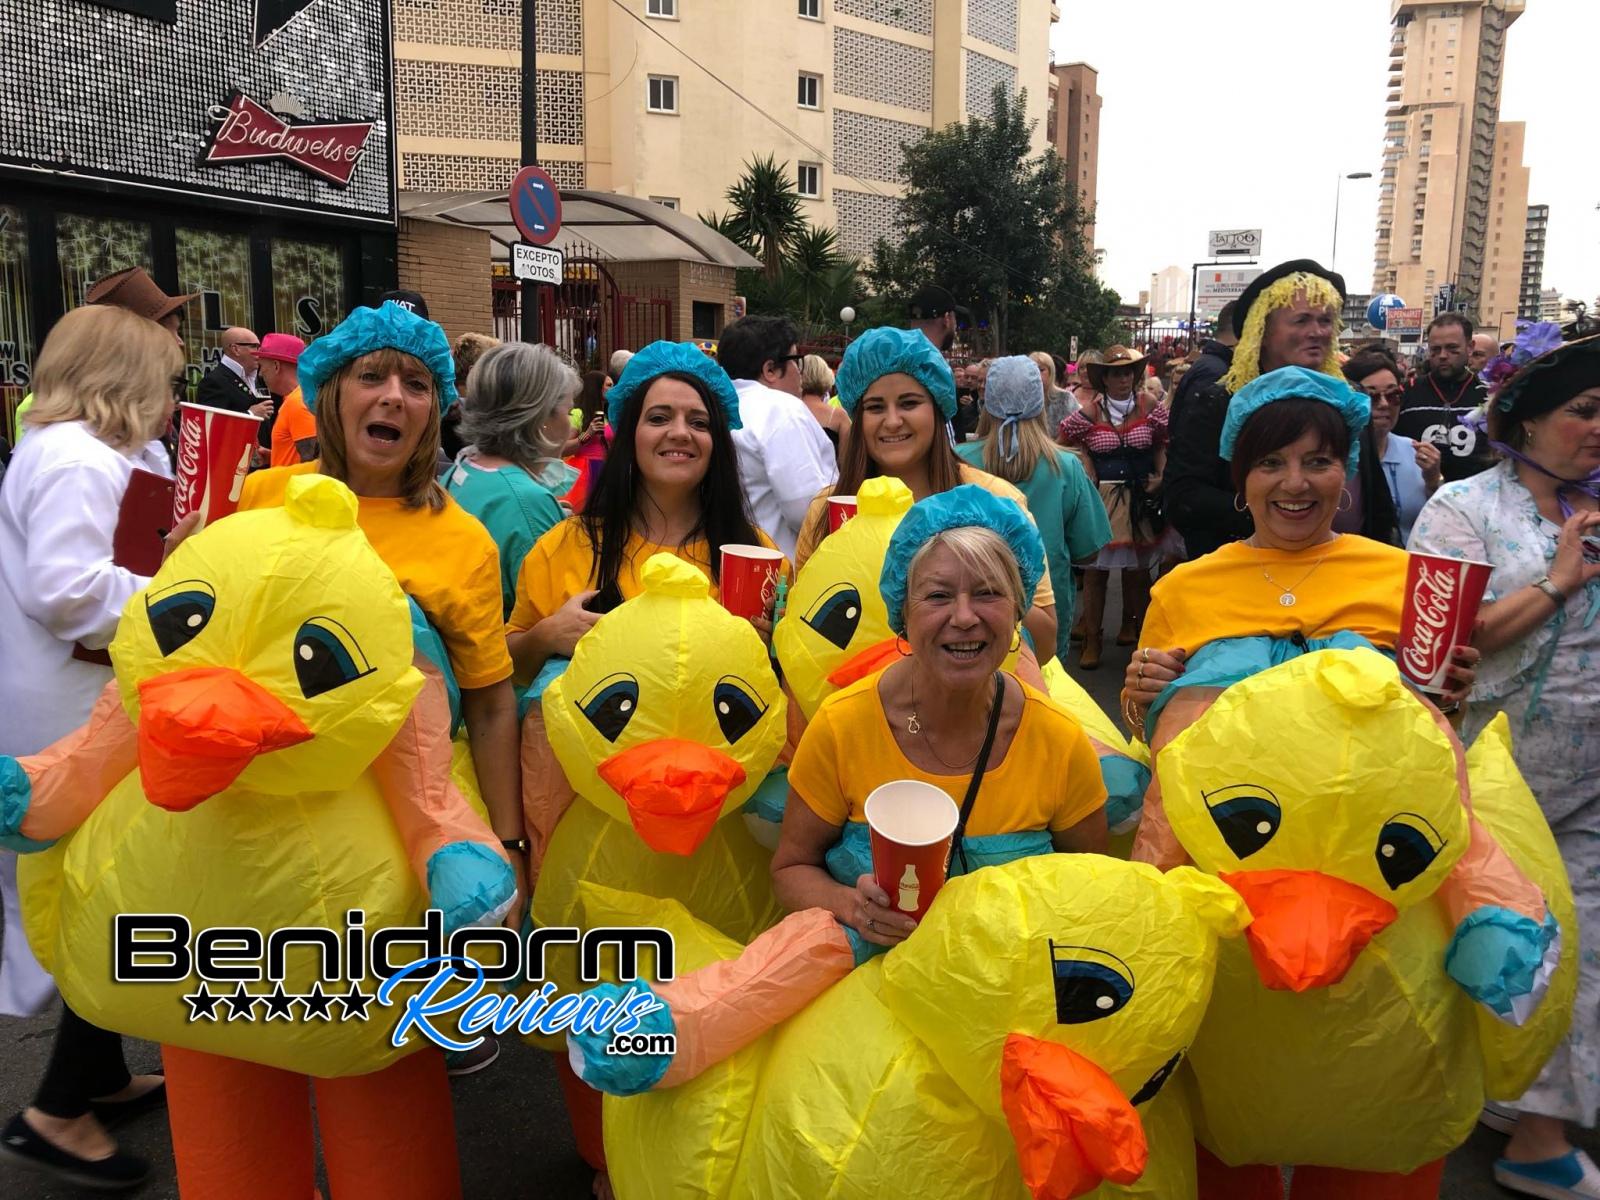 Benidorm-Fiestas-2019-Fancy-Dress-200